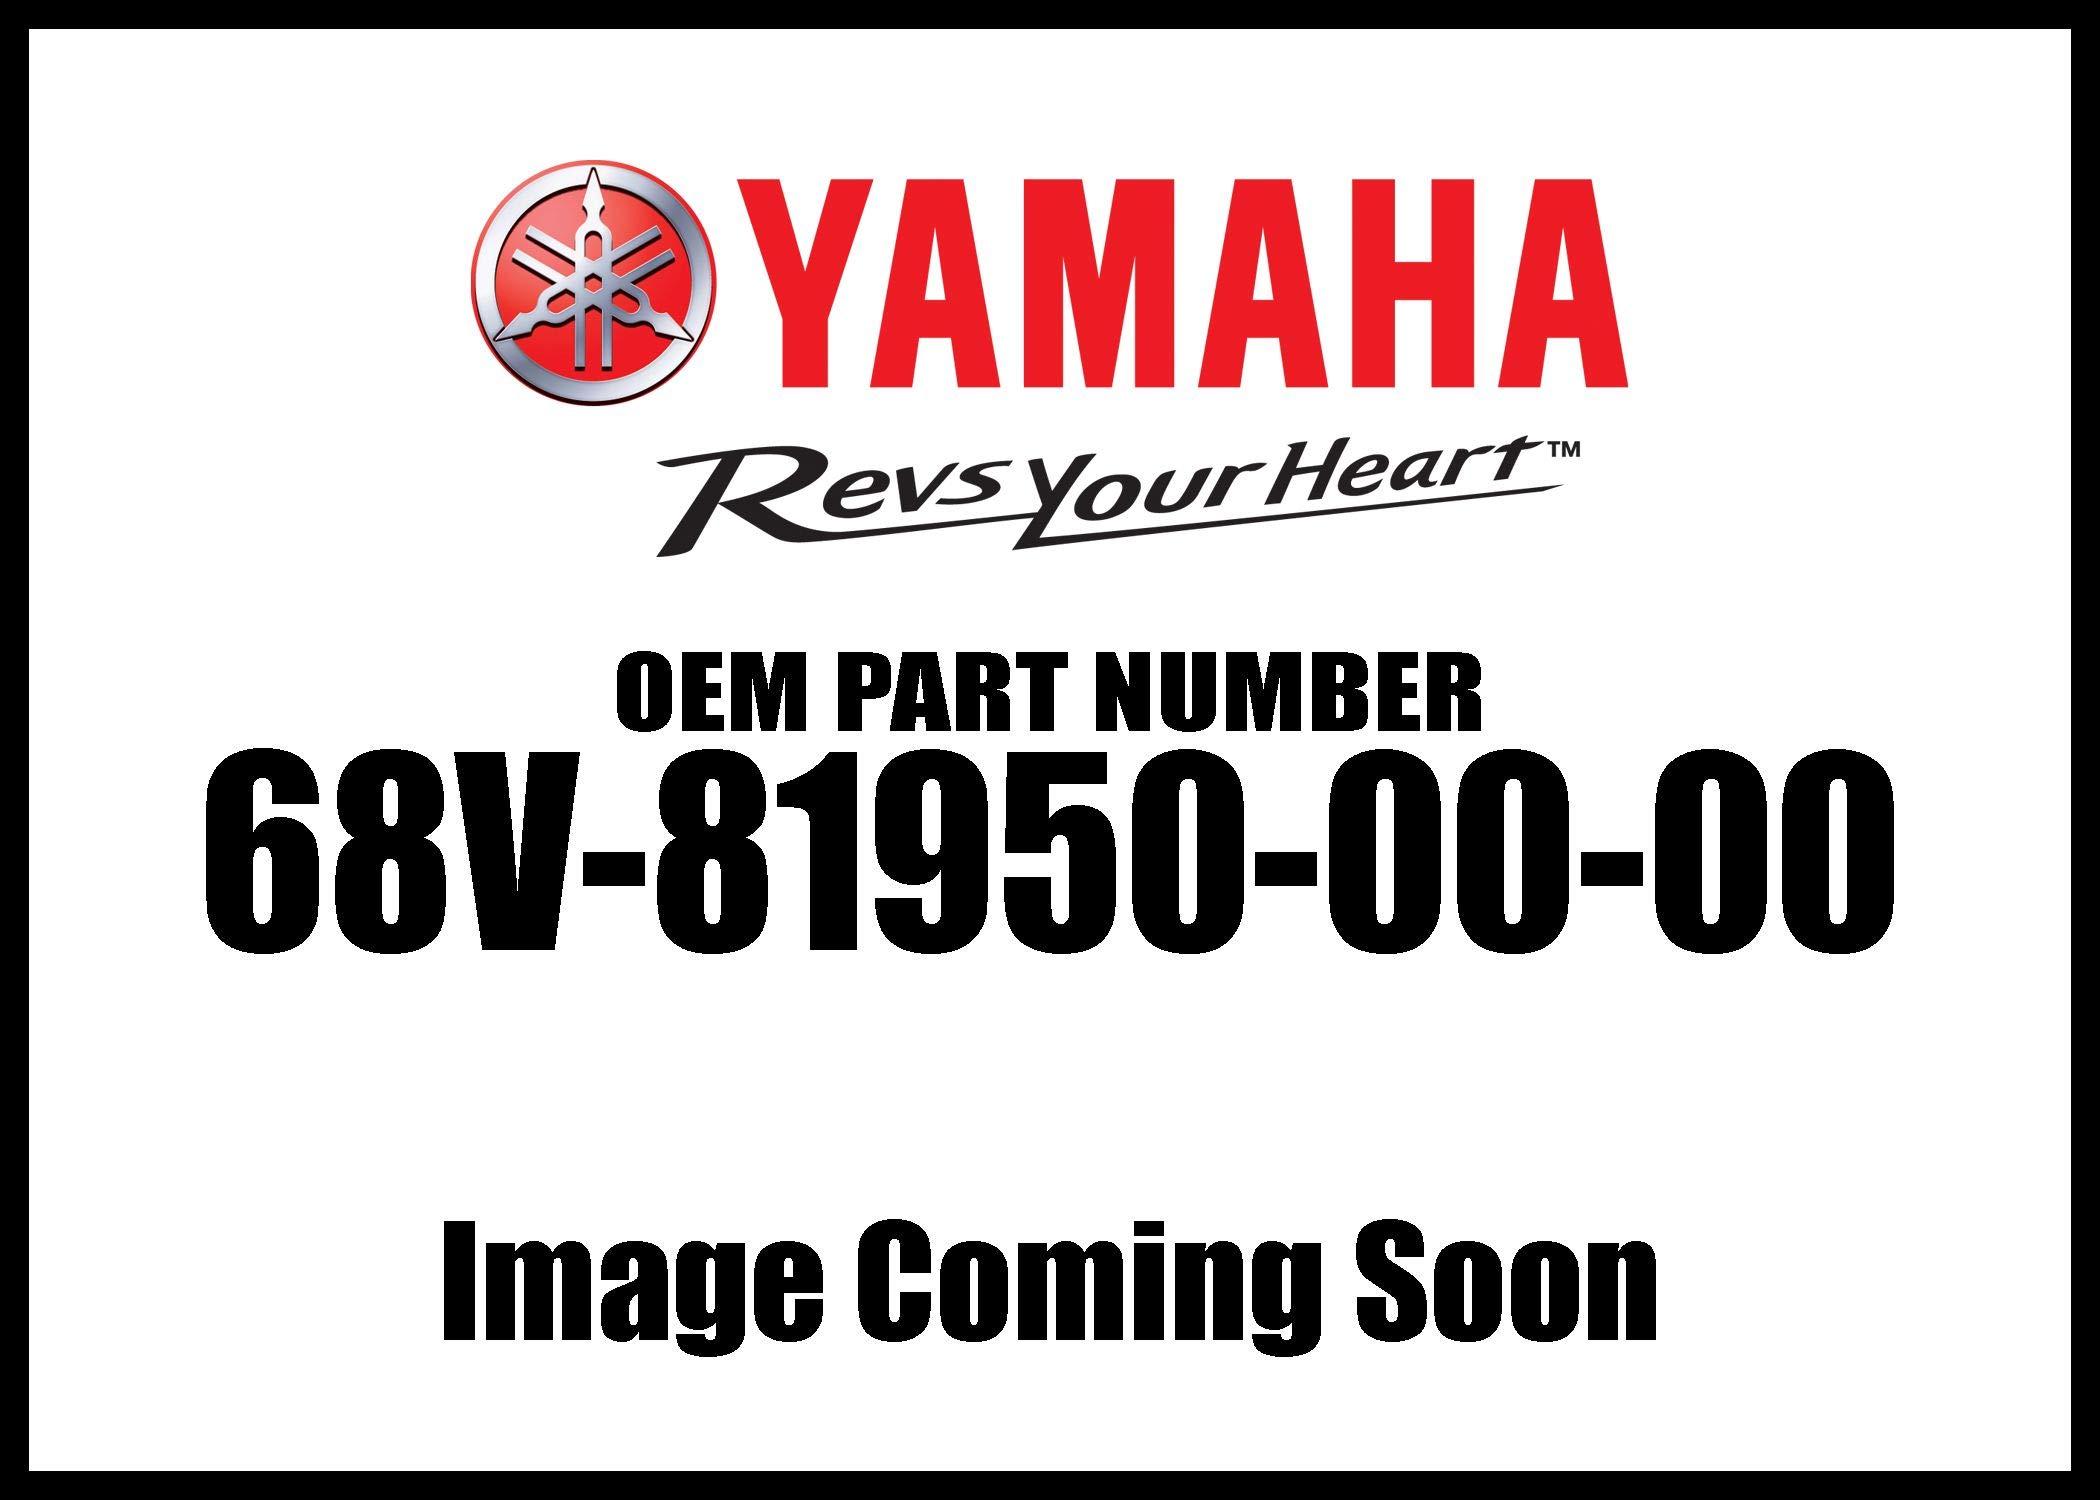 Yamaha 68V-81950-00-00 Relay Assy; Outboard Waverunner Sterndrive Marine Boat Parts by Yamaha